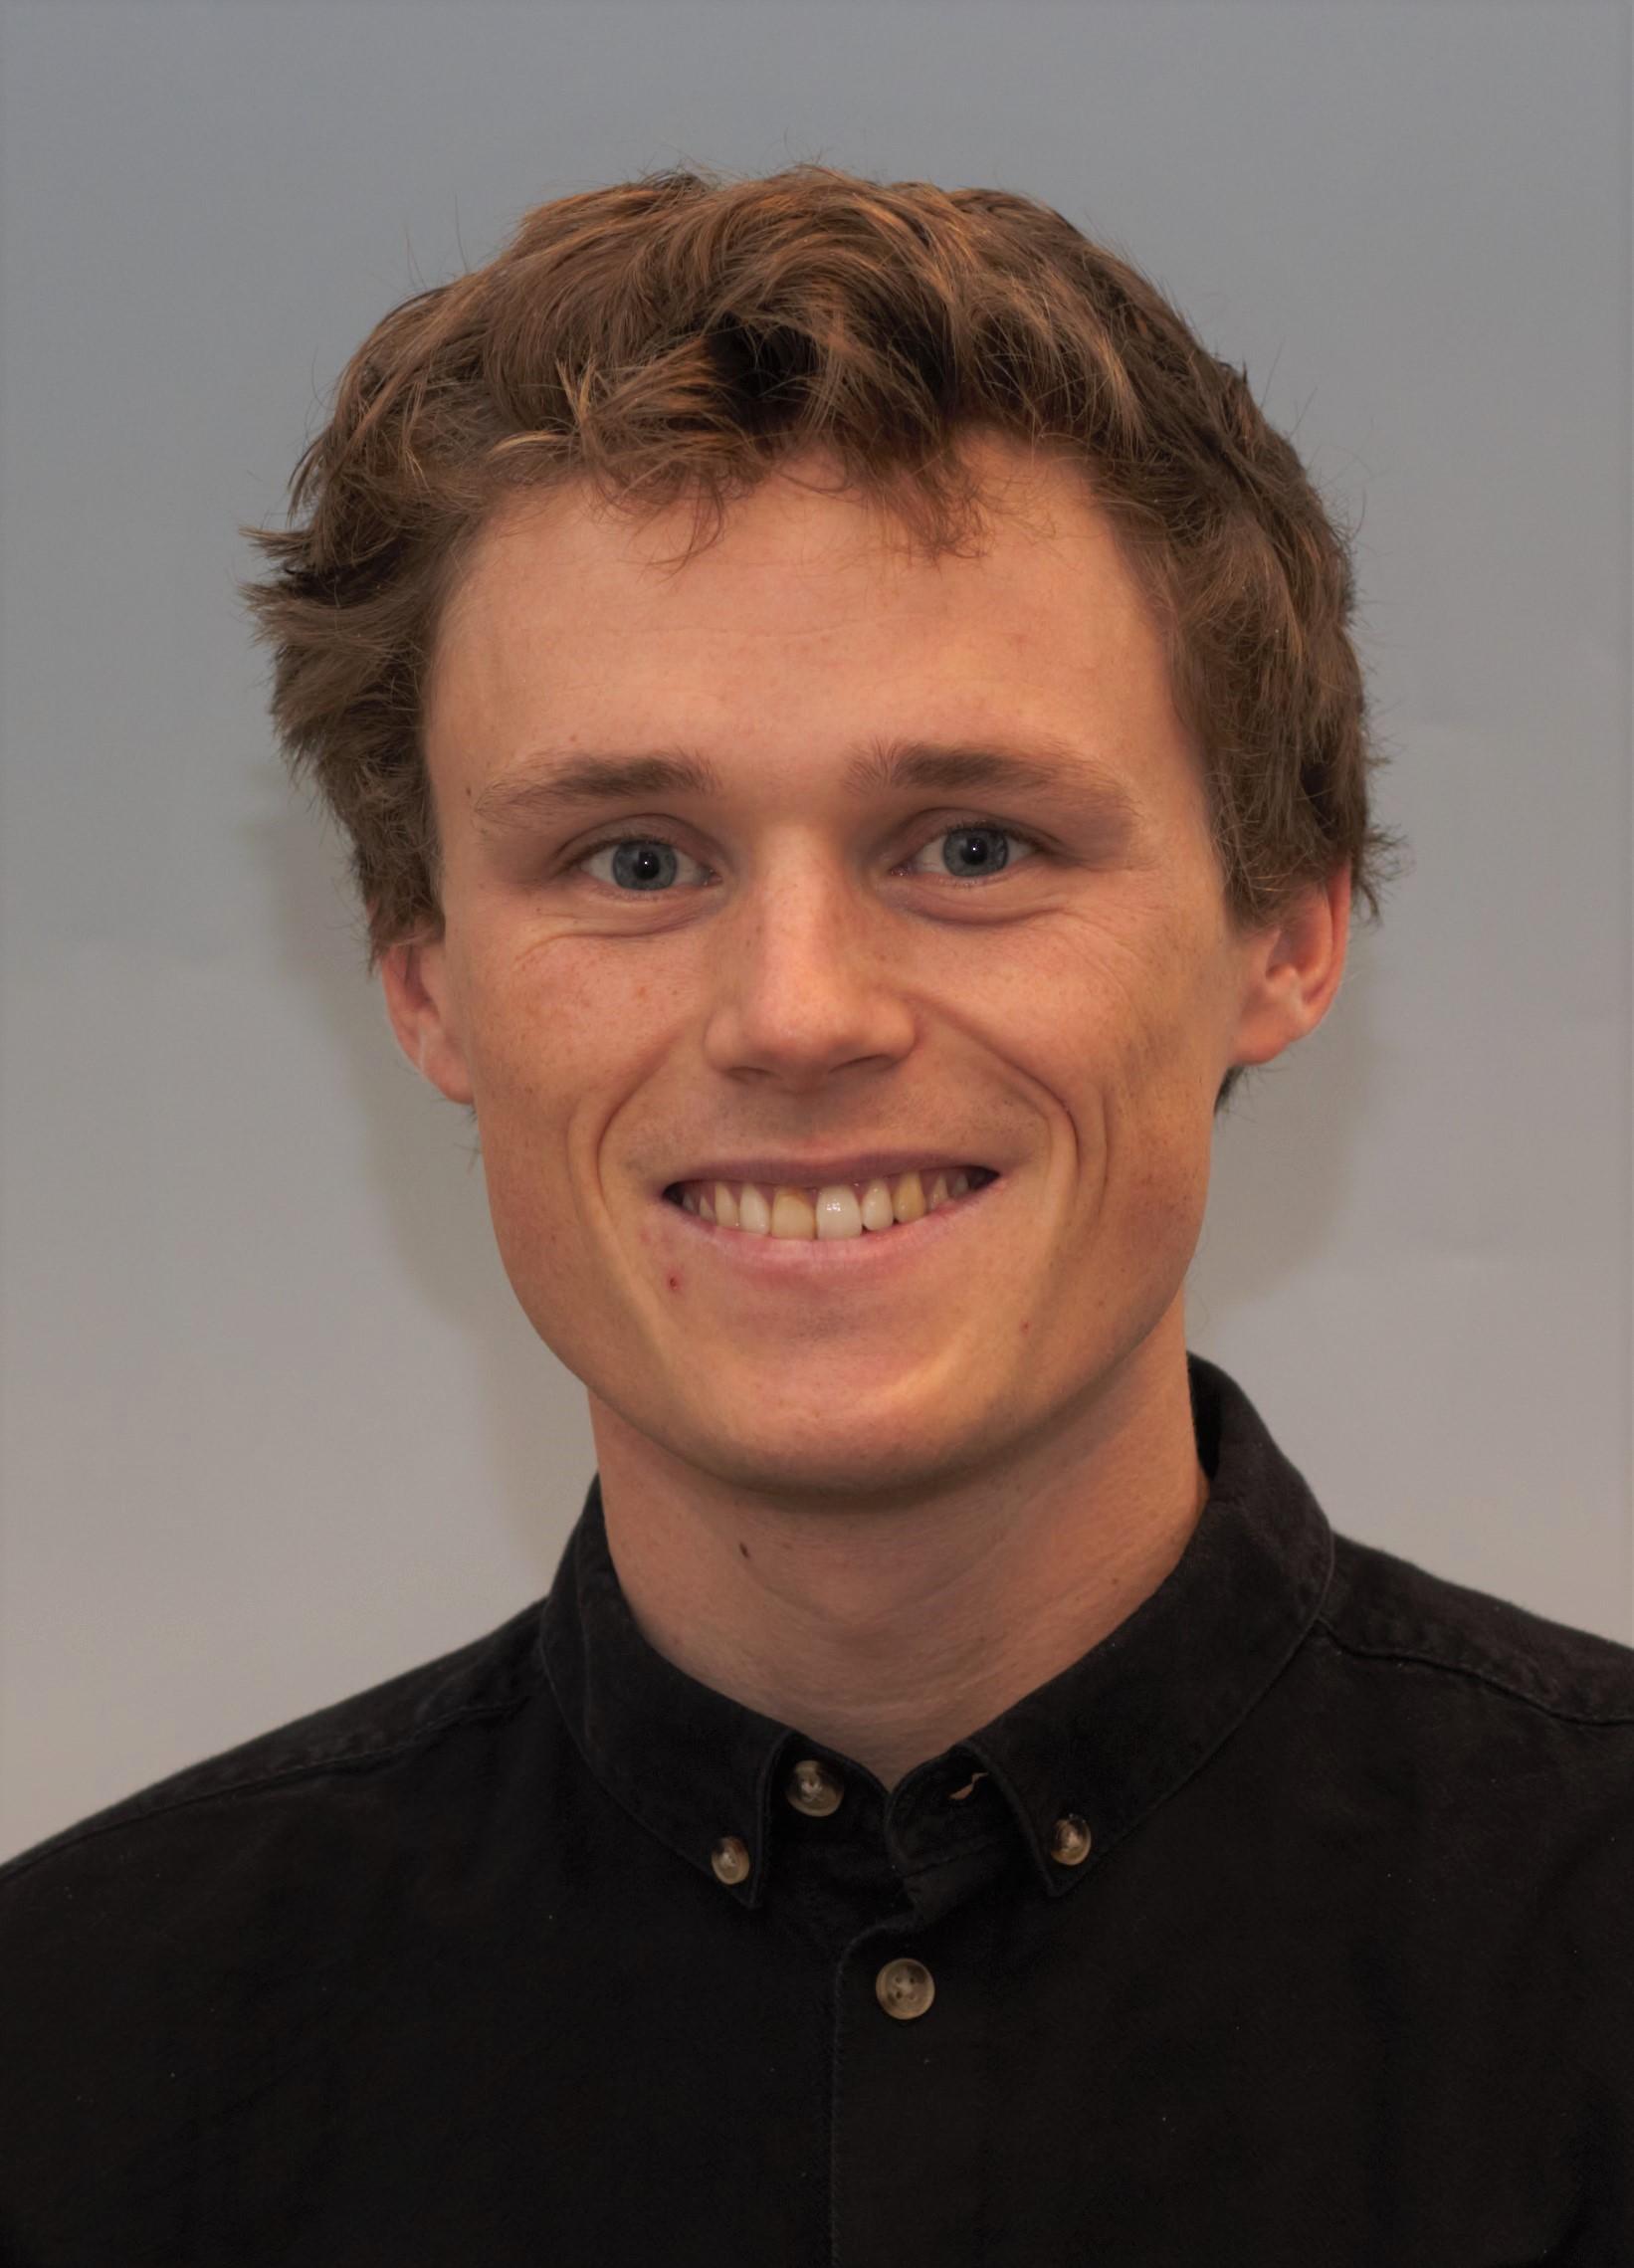 Andreas Videbæk Jensen